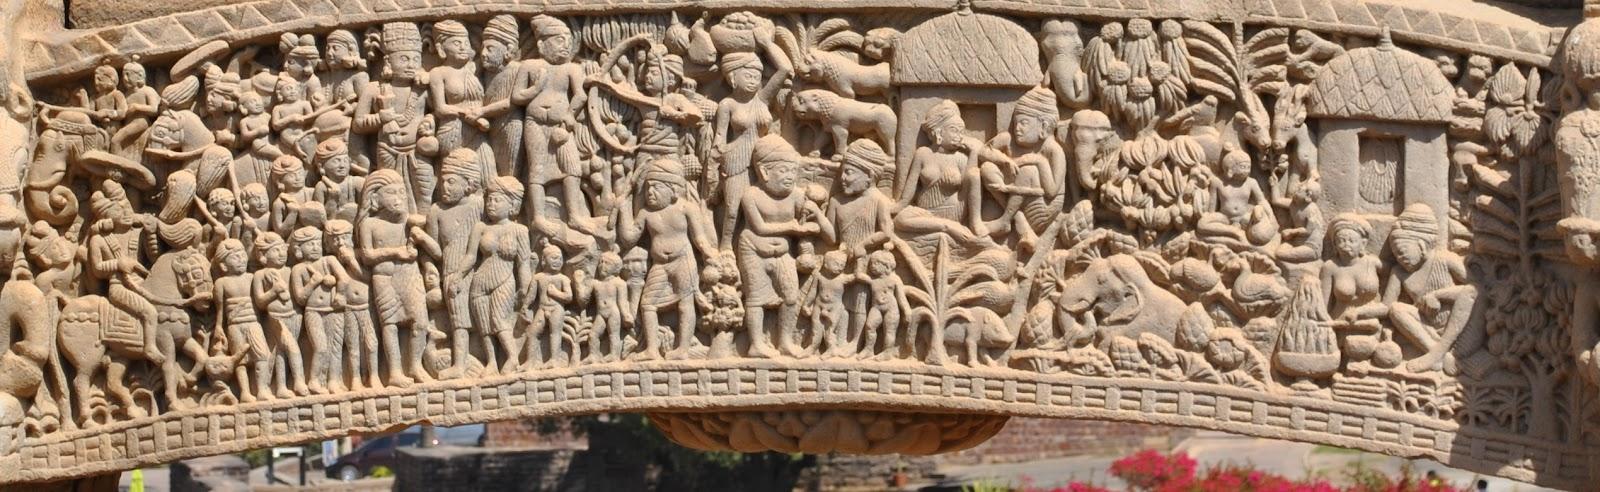 4.+Stupa+1+Northern+Toran+Jataka+Tales+-+Vasantara+and+his+selfless+generosity